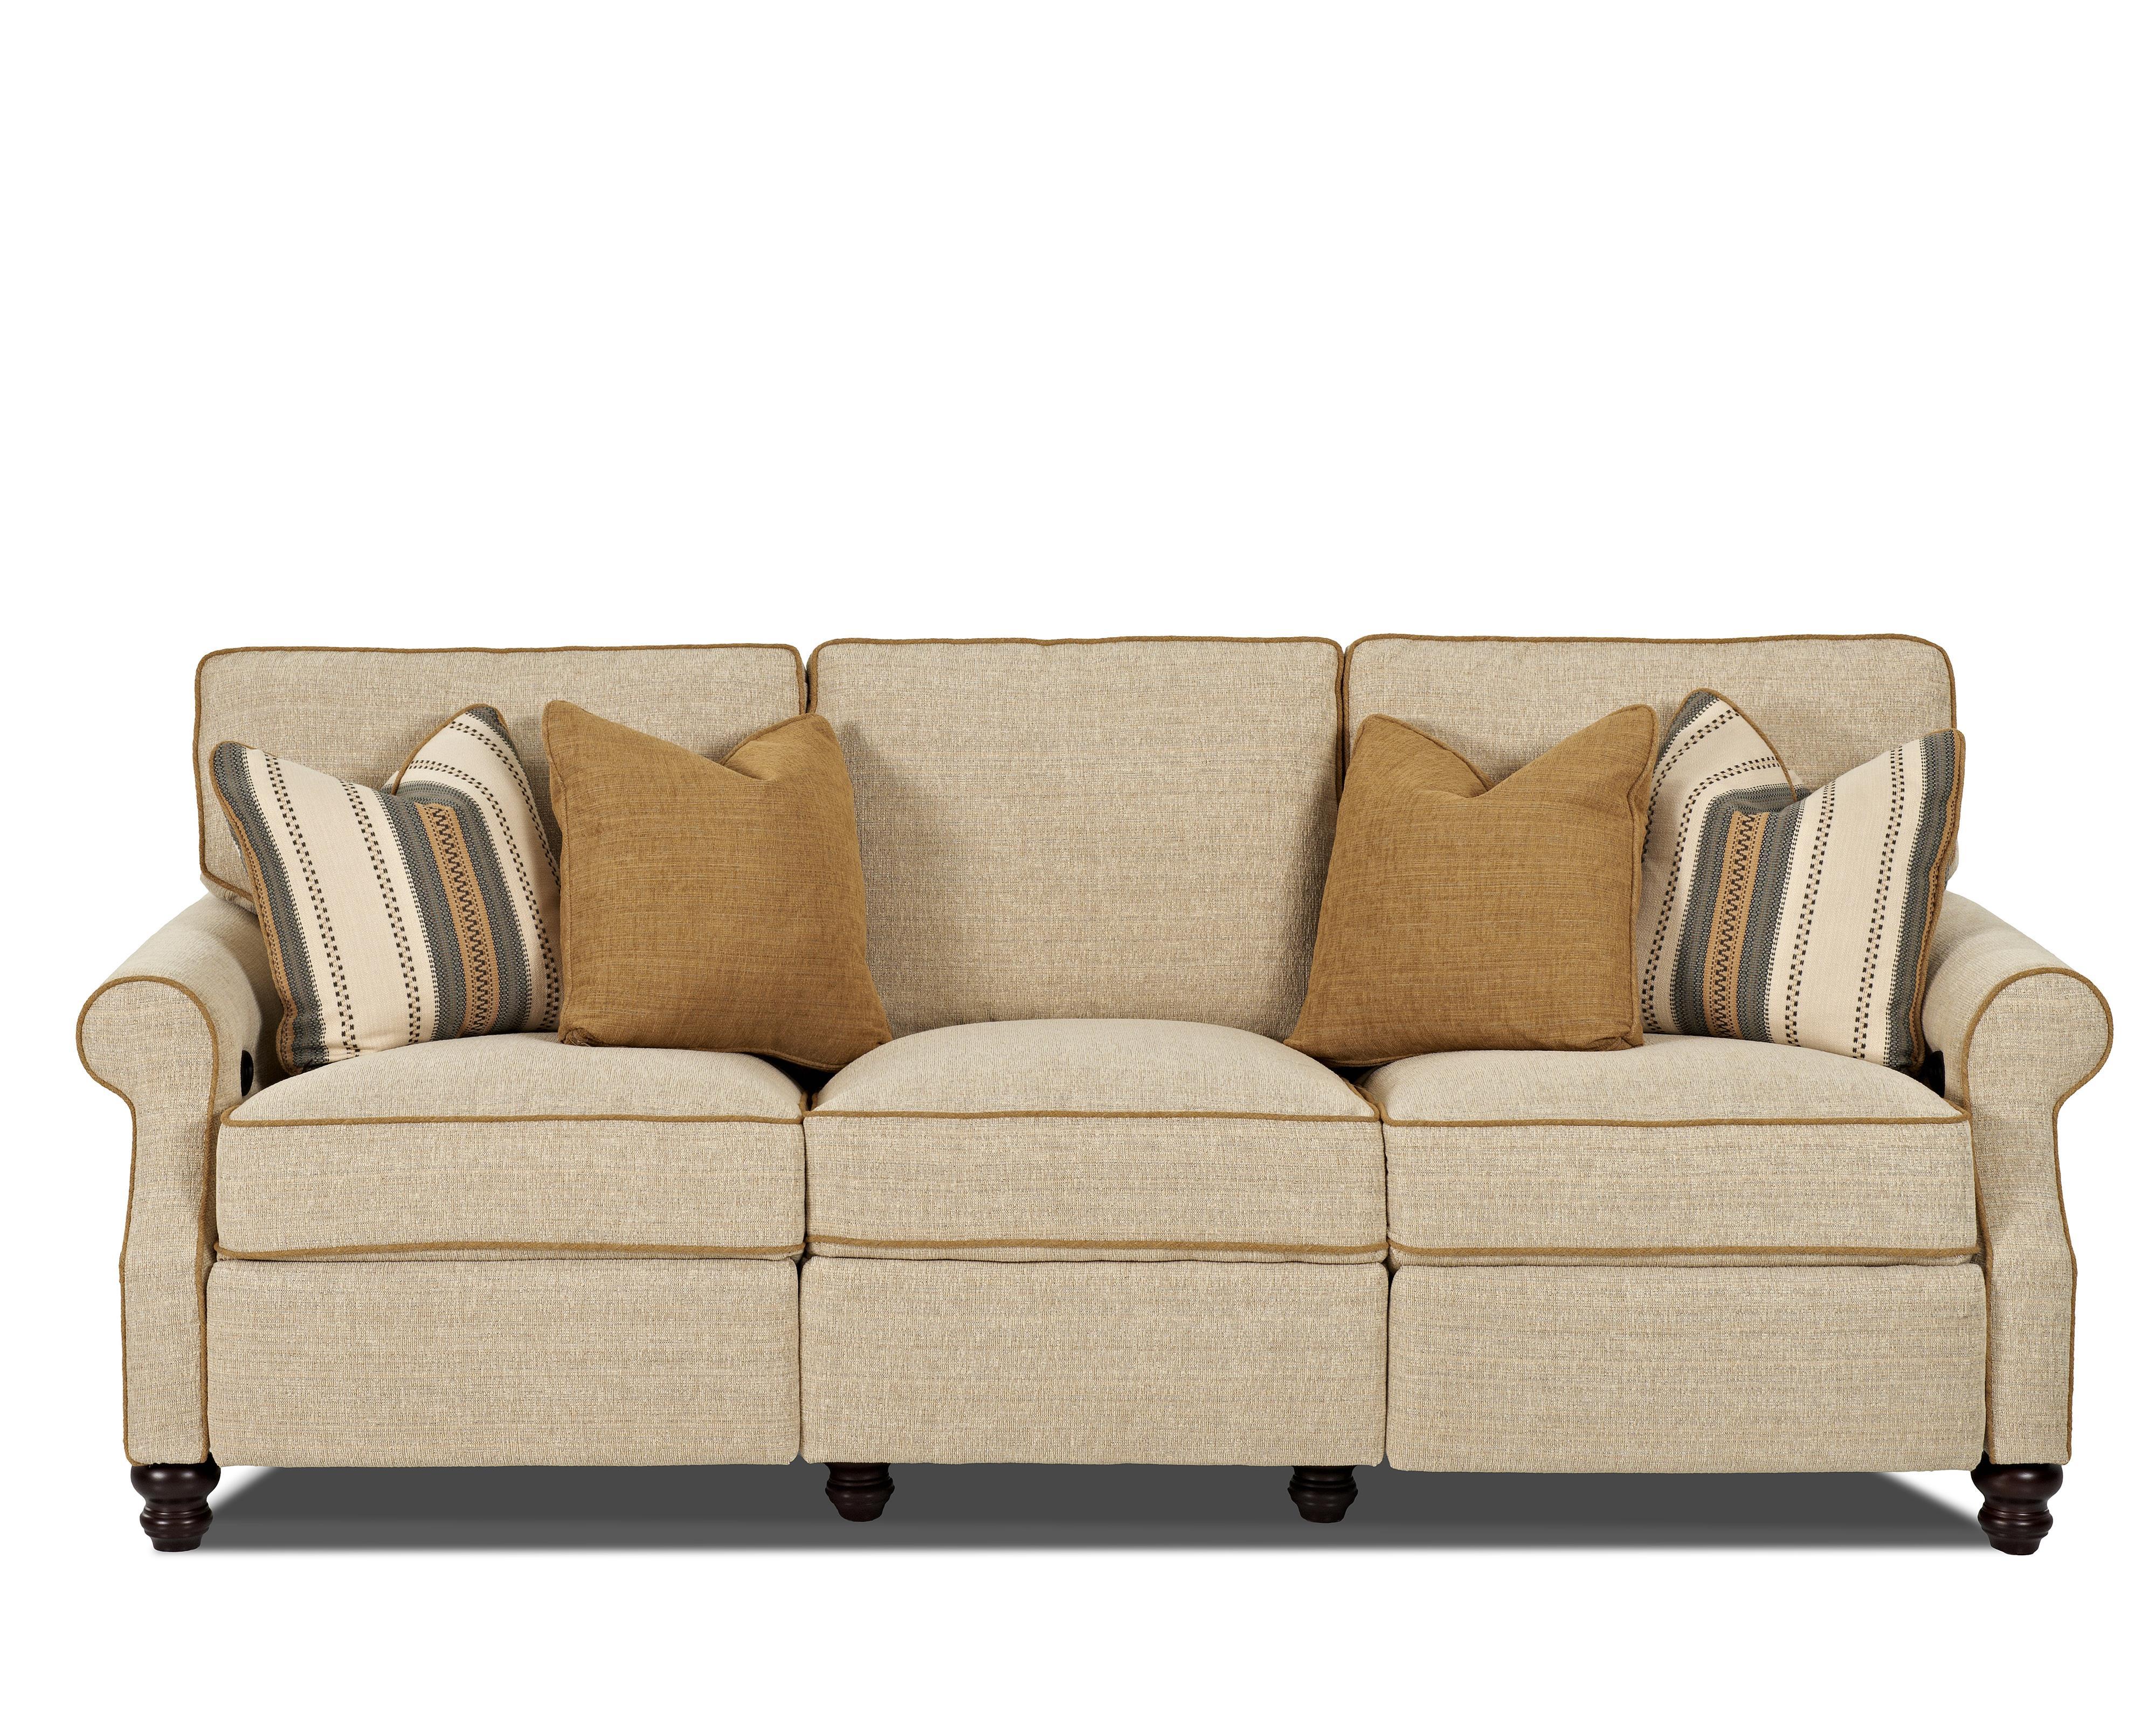 Trisha Yearwood Home Tifton Traditional Power Hybrid Sofa